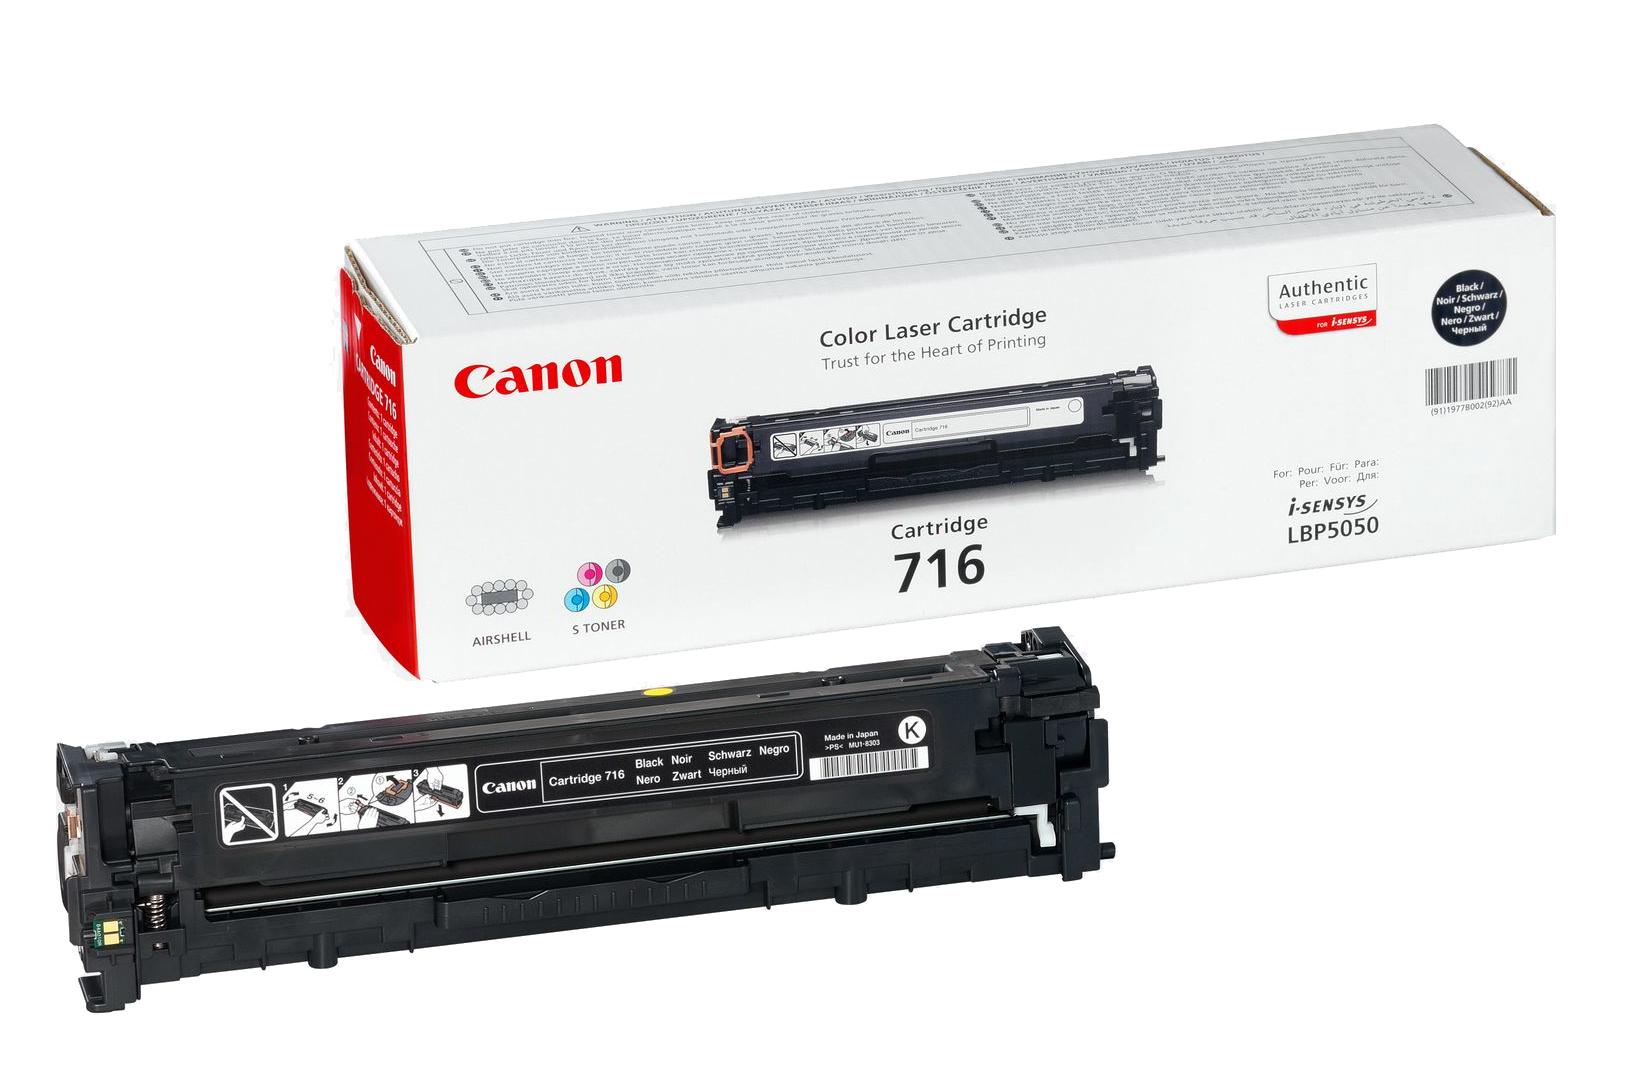 Canon Cartridge 716 Black Original Negro 1 pieza(s)